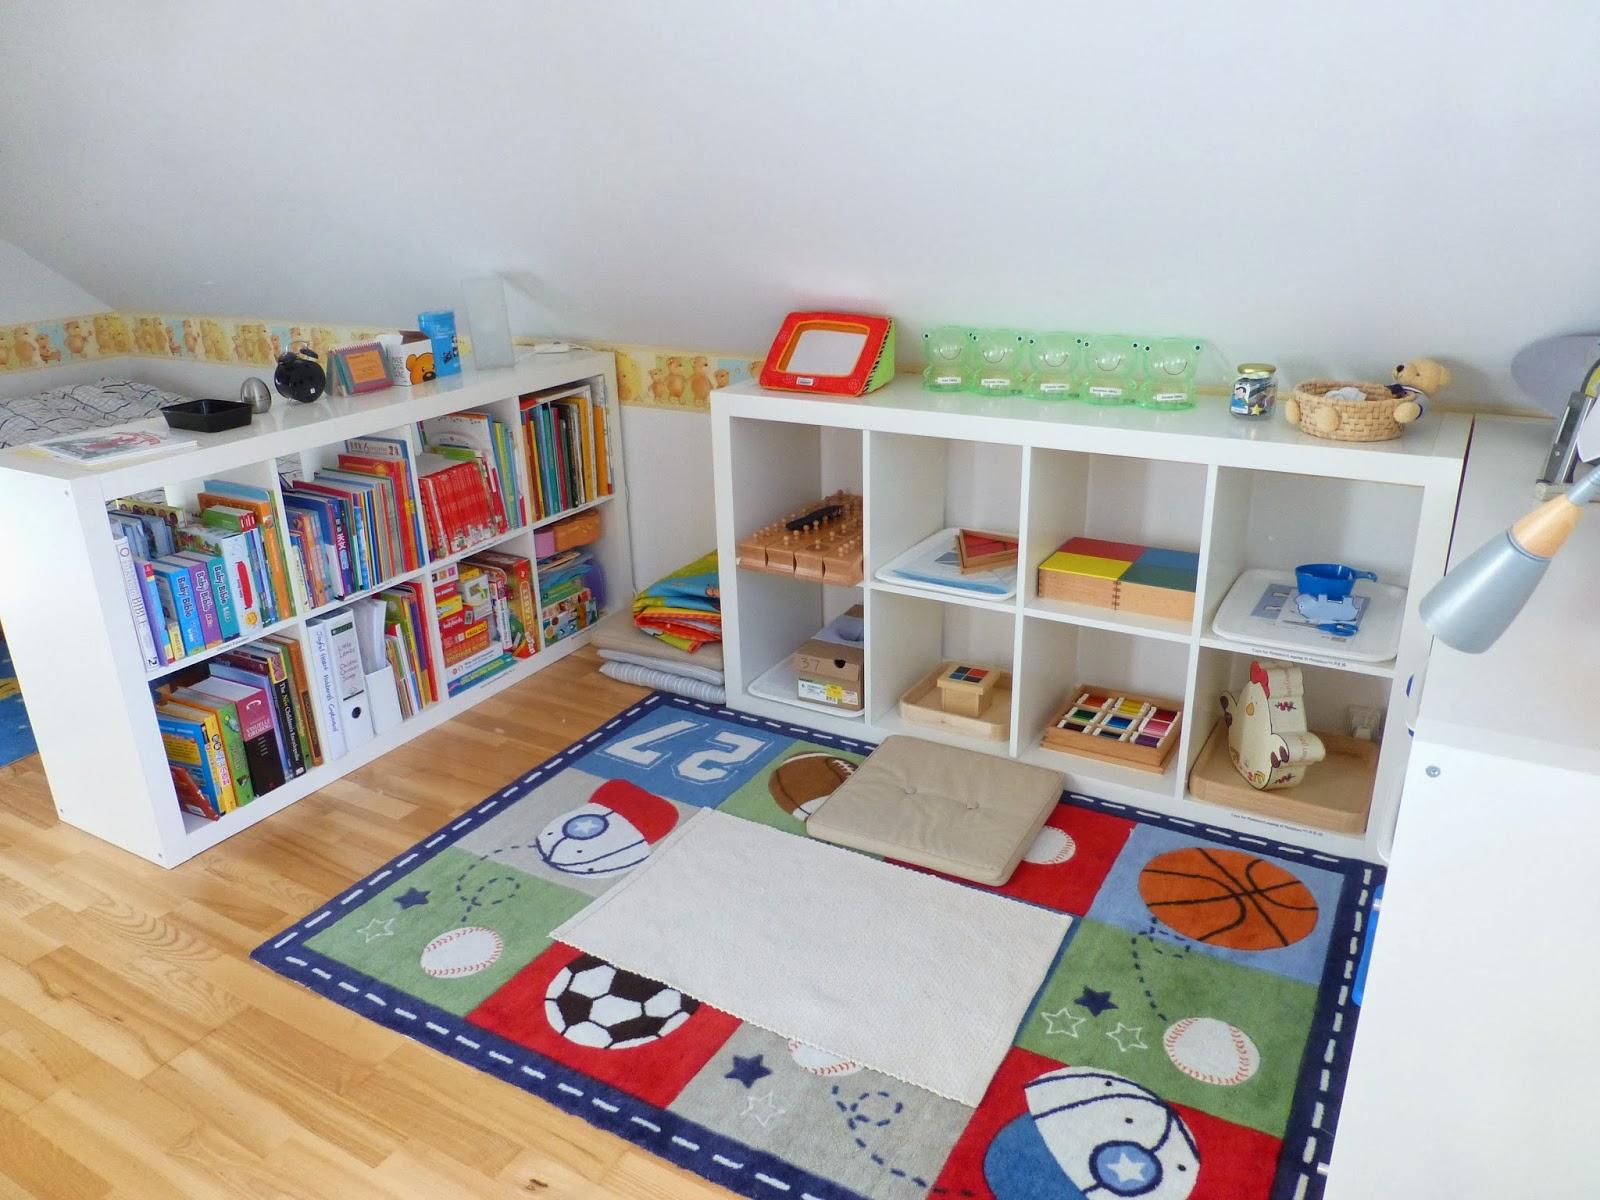 How To Organize Your Childu0027s Montessori Classroom?